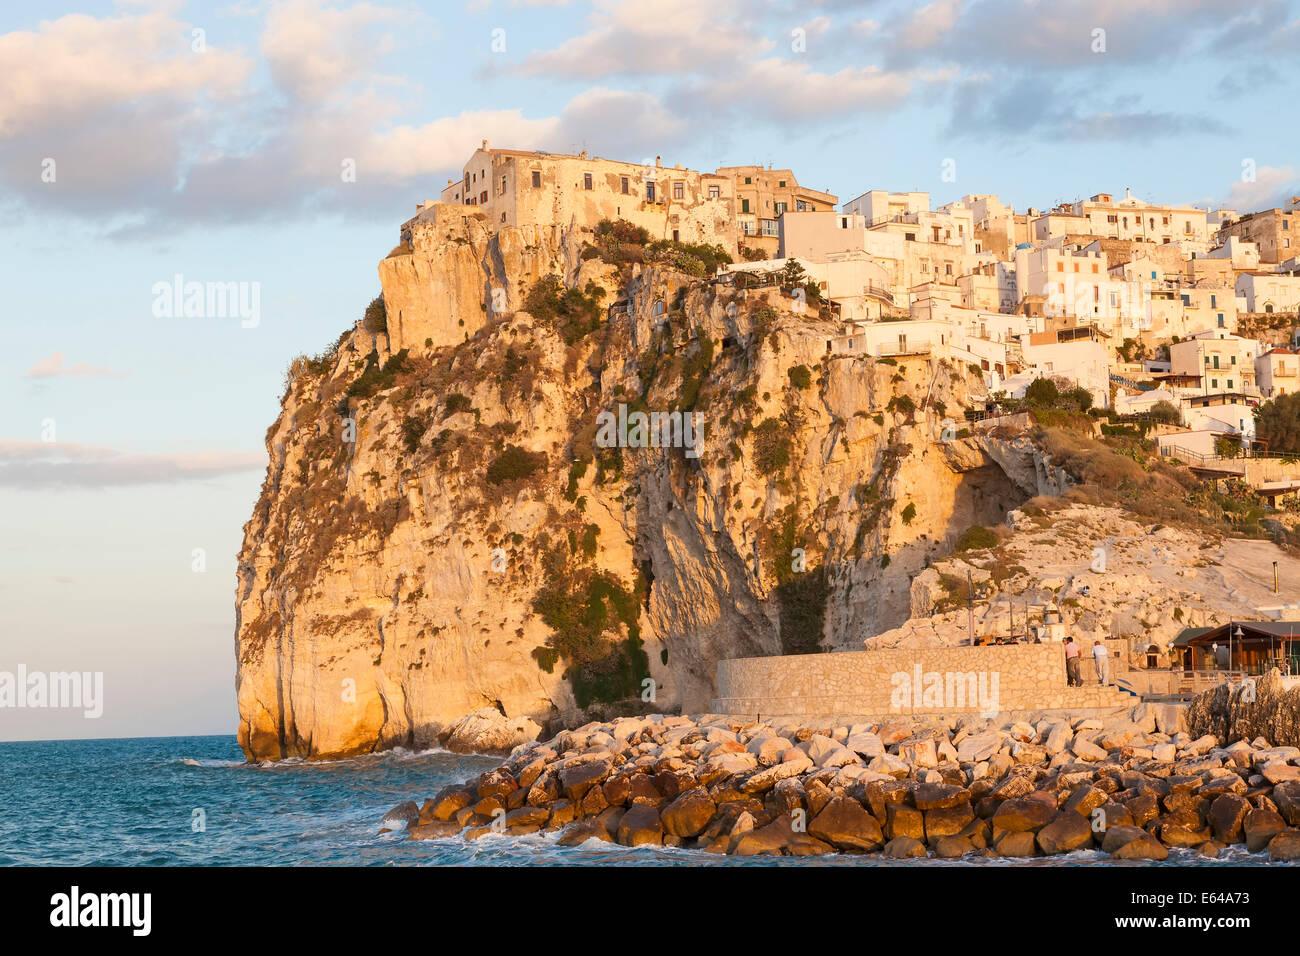 Coastal Village Peschici, Promontorio del Gargano, Apulien, Italien Stockbild